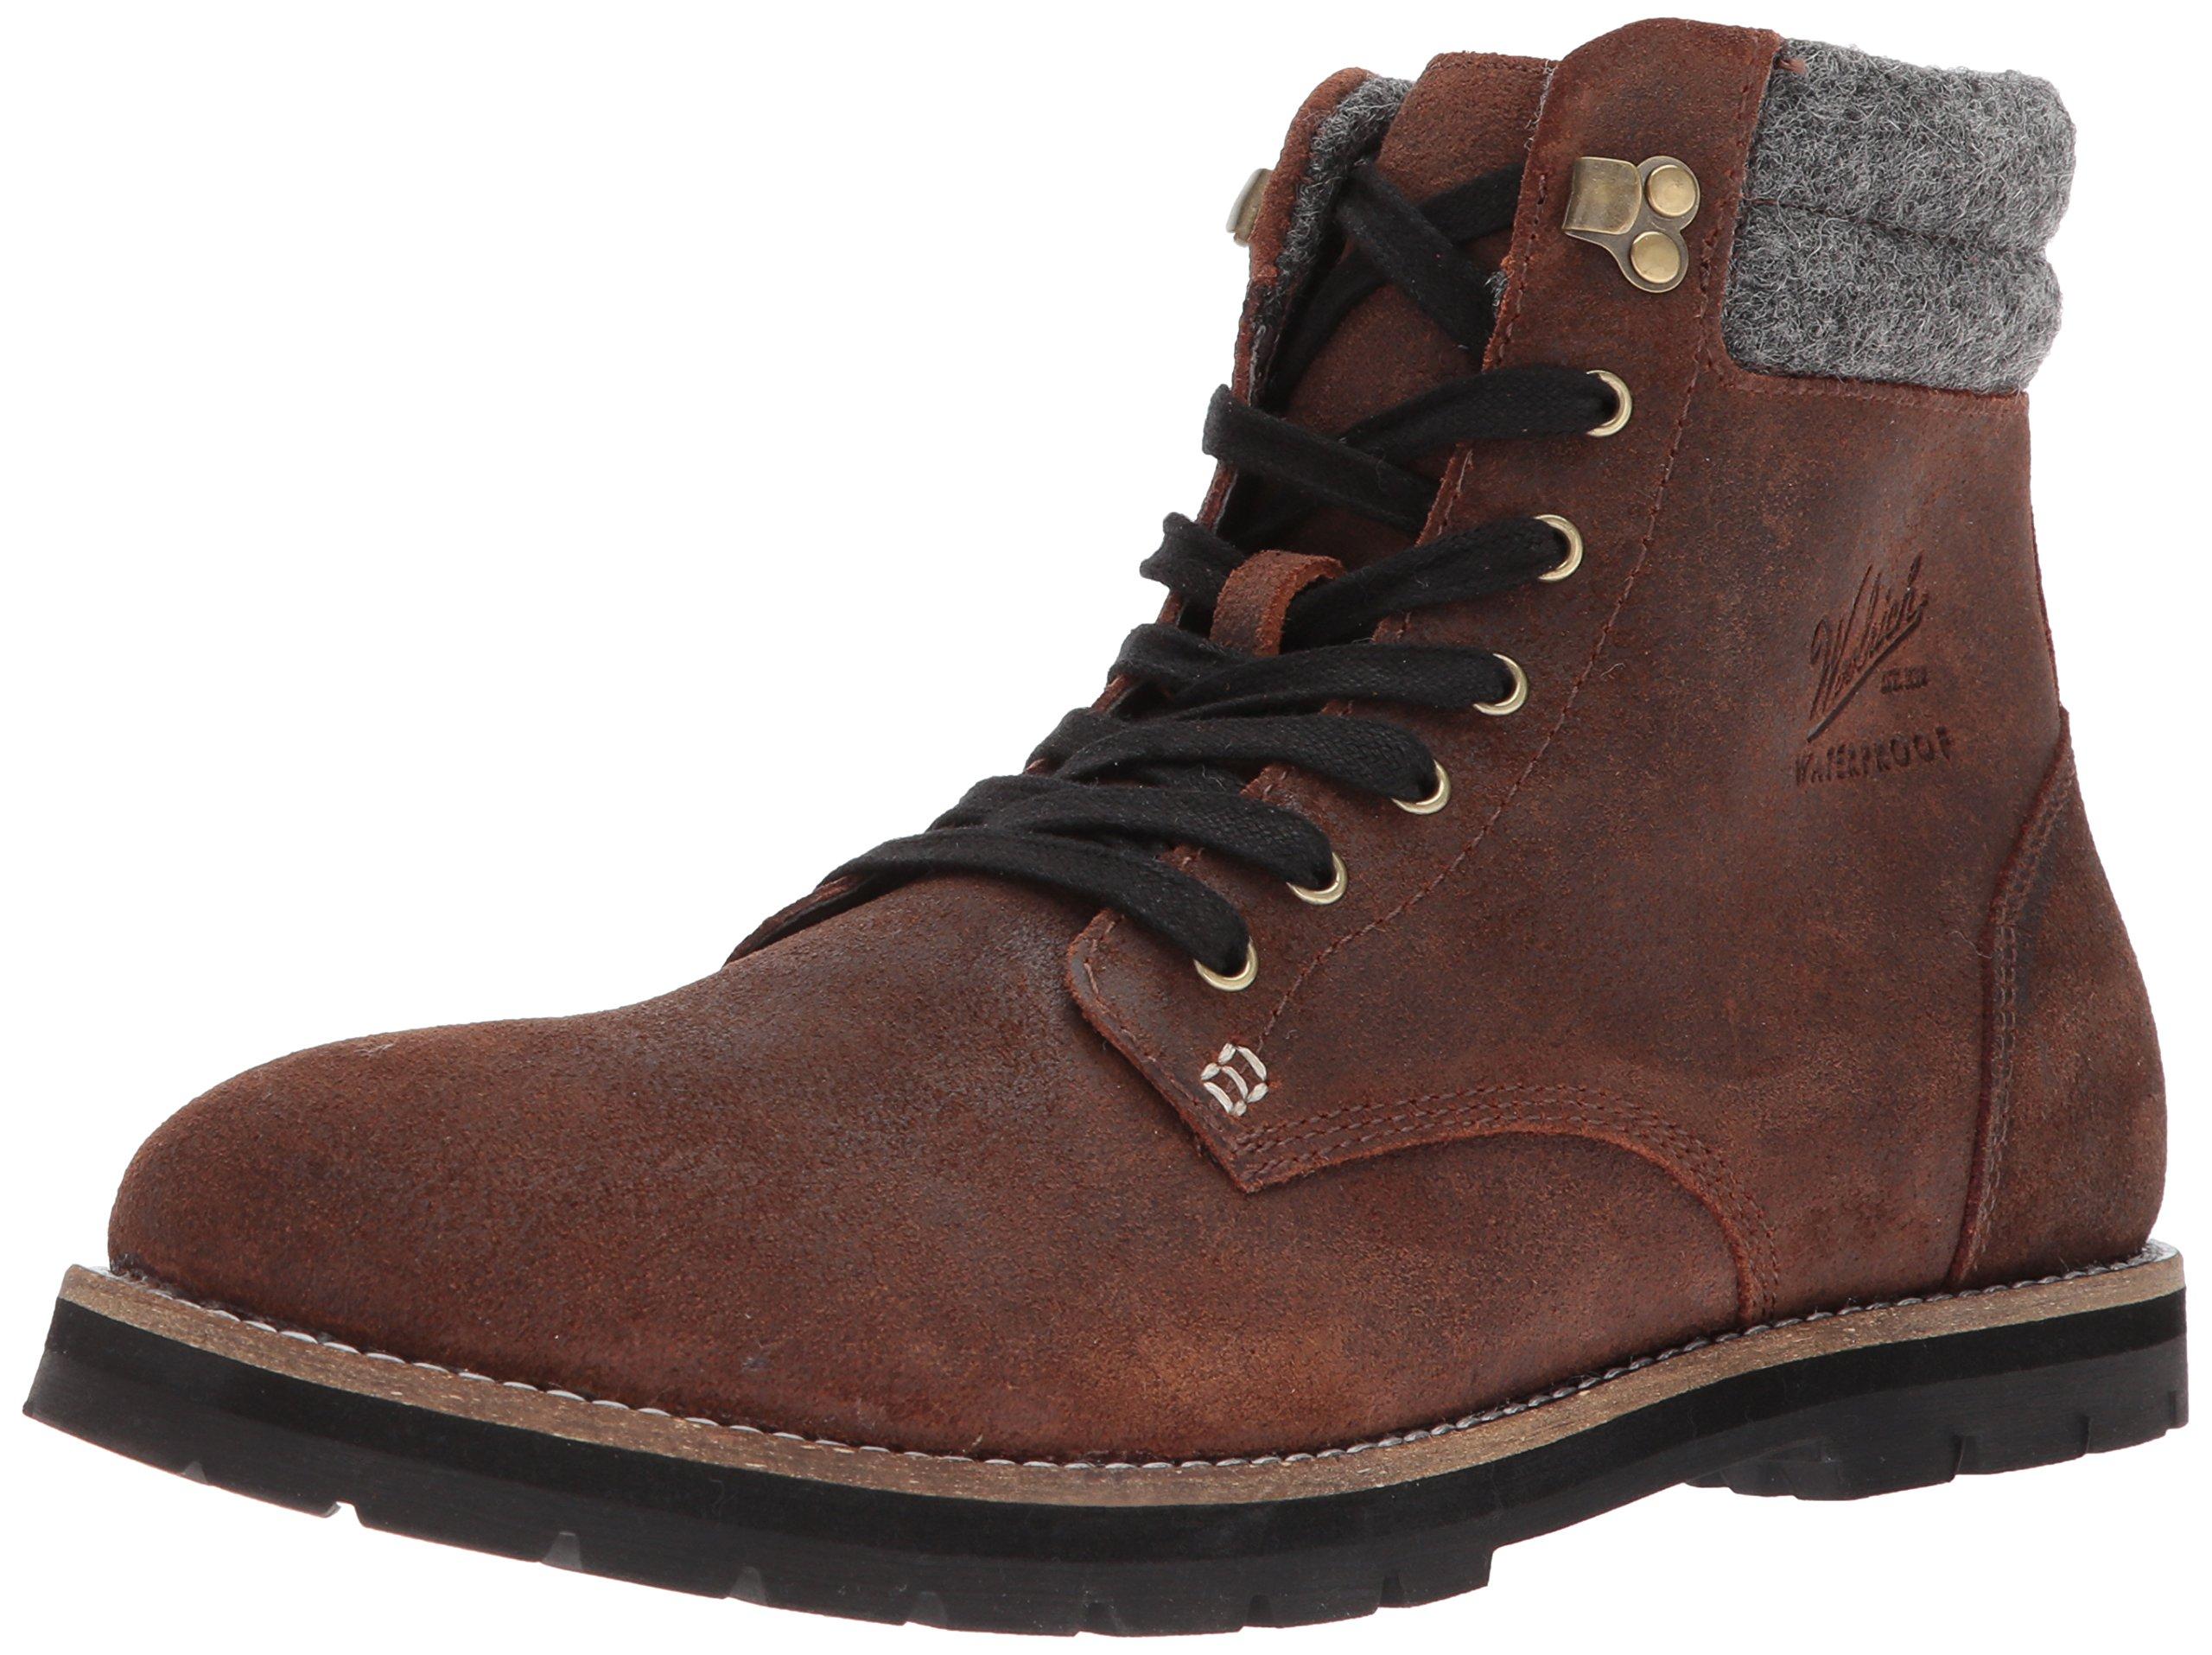 Woolrich Men's 1830 Explorer Chukka Boot, Chocolate/Ash, 12 M US